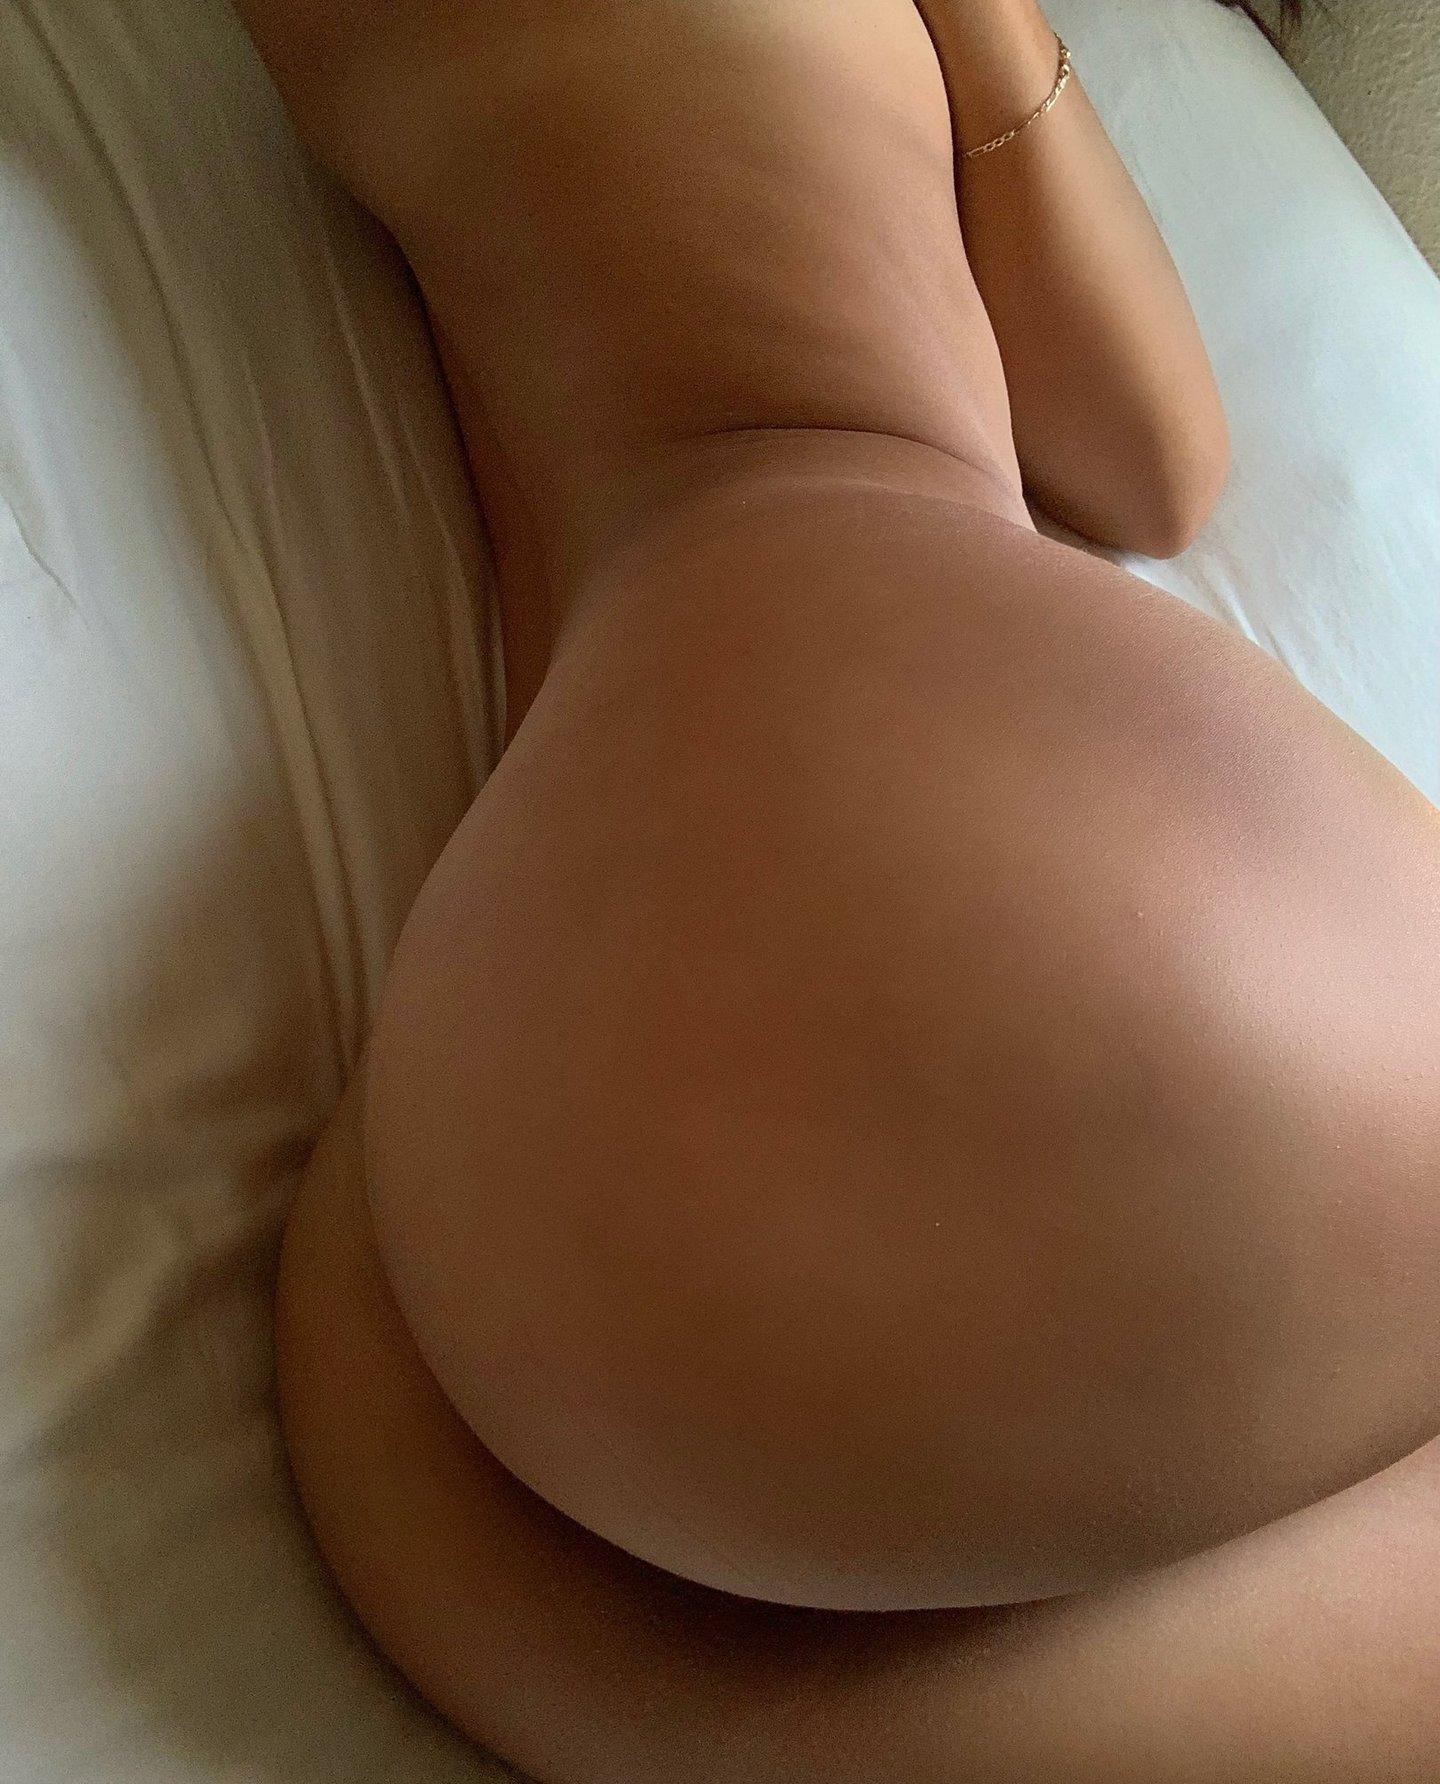 Goddess Angelina Angelina Onlyfans Nude Leaks 0006